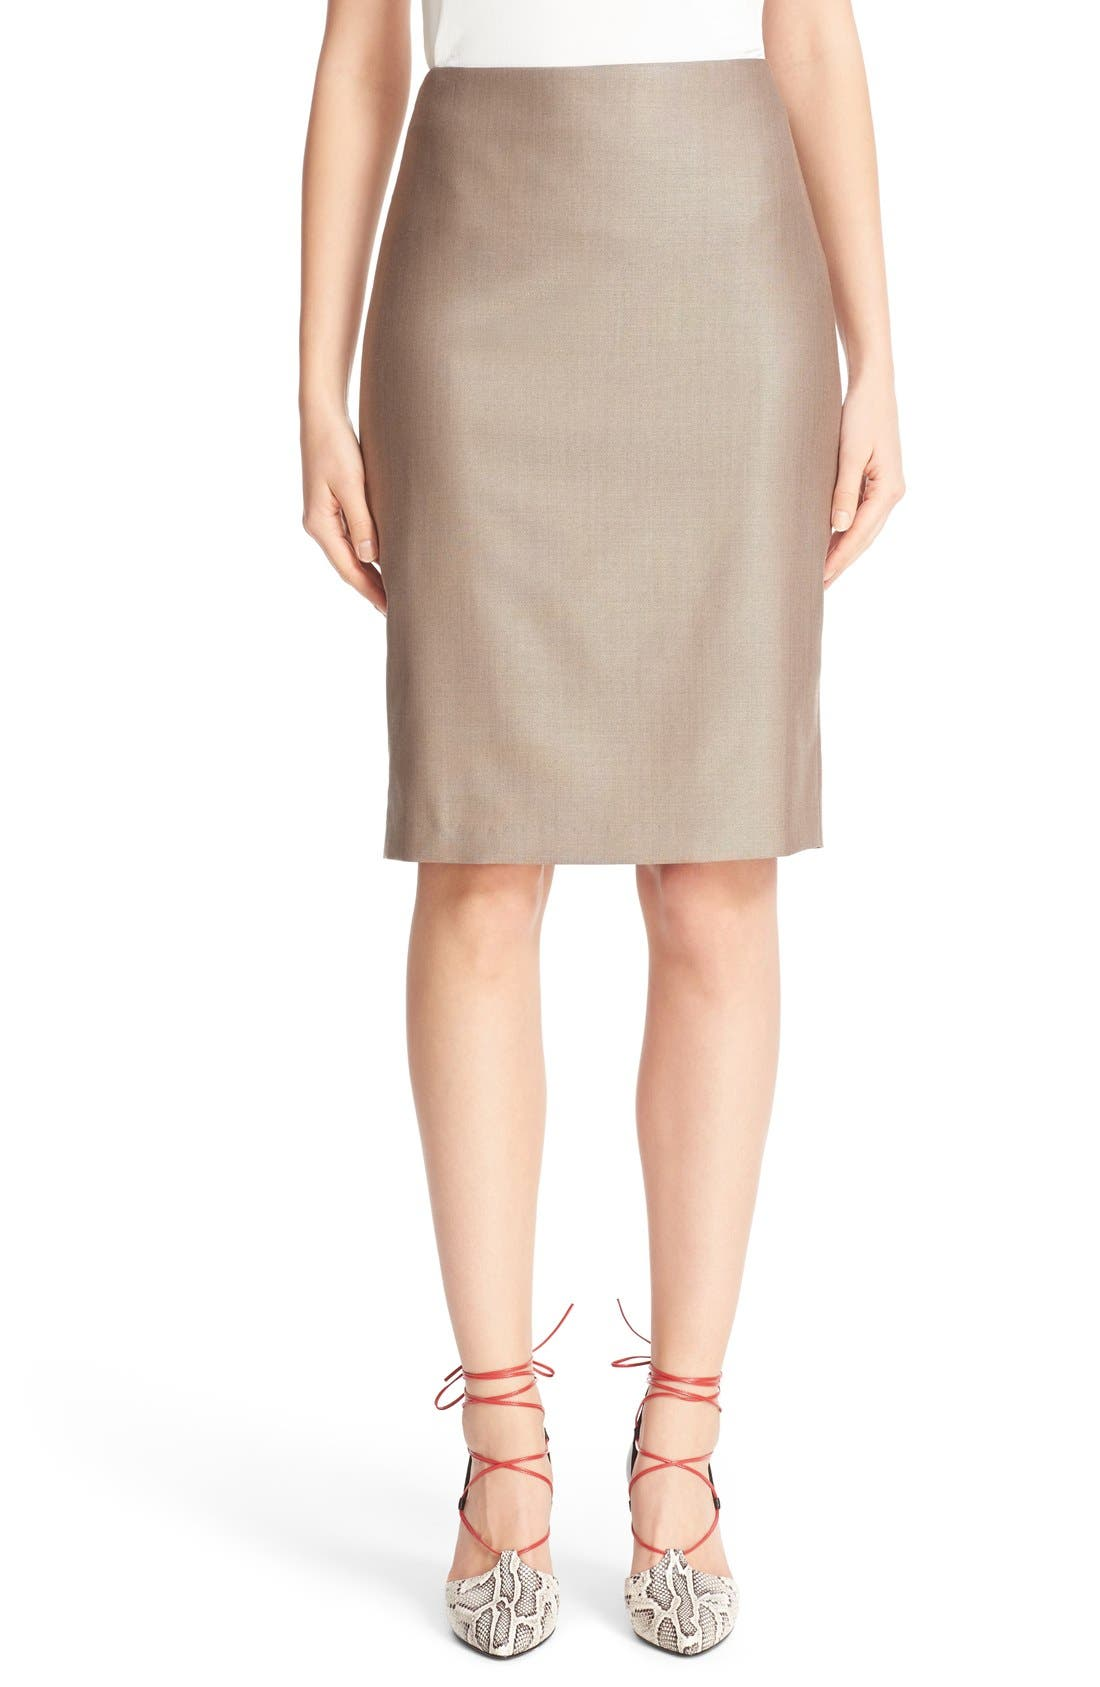 Alternate Image 1 Selected - Max Mara Wool Blend Pencil Skirt